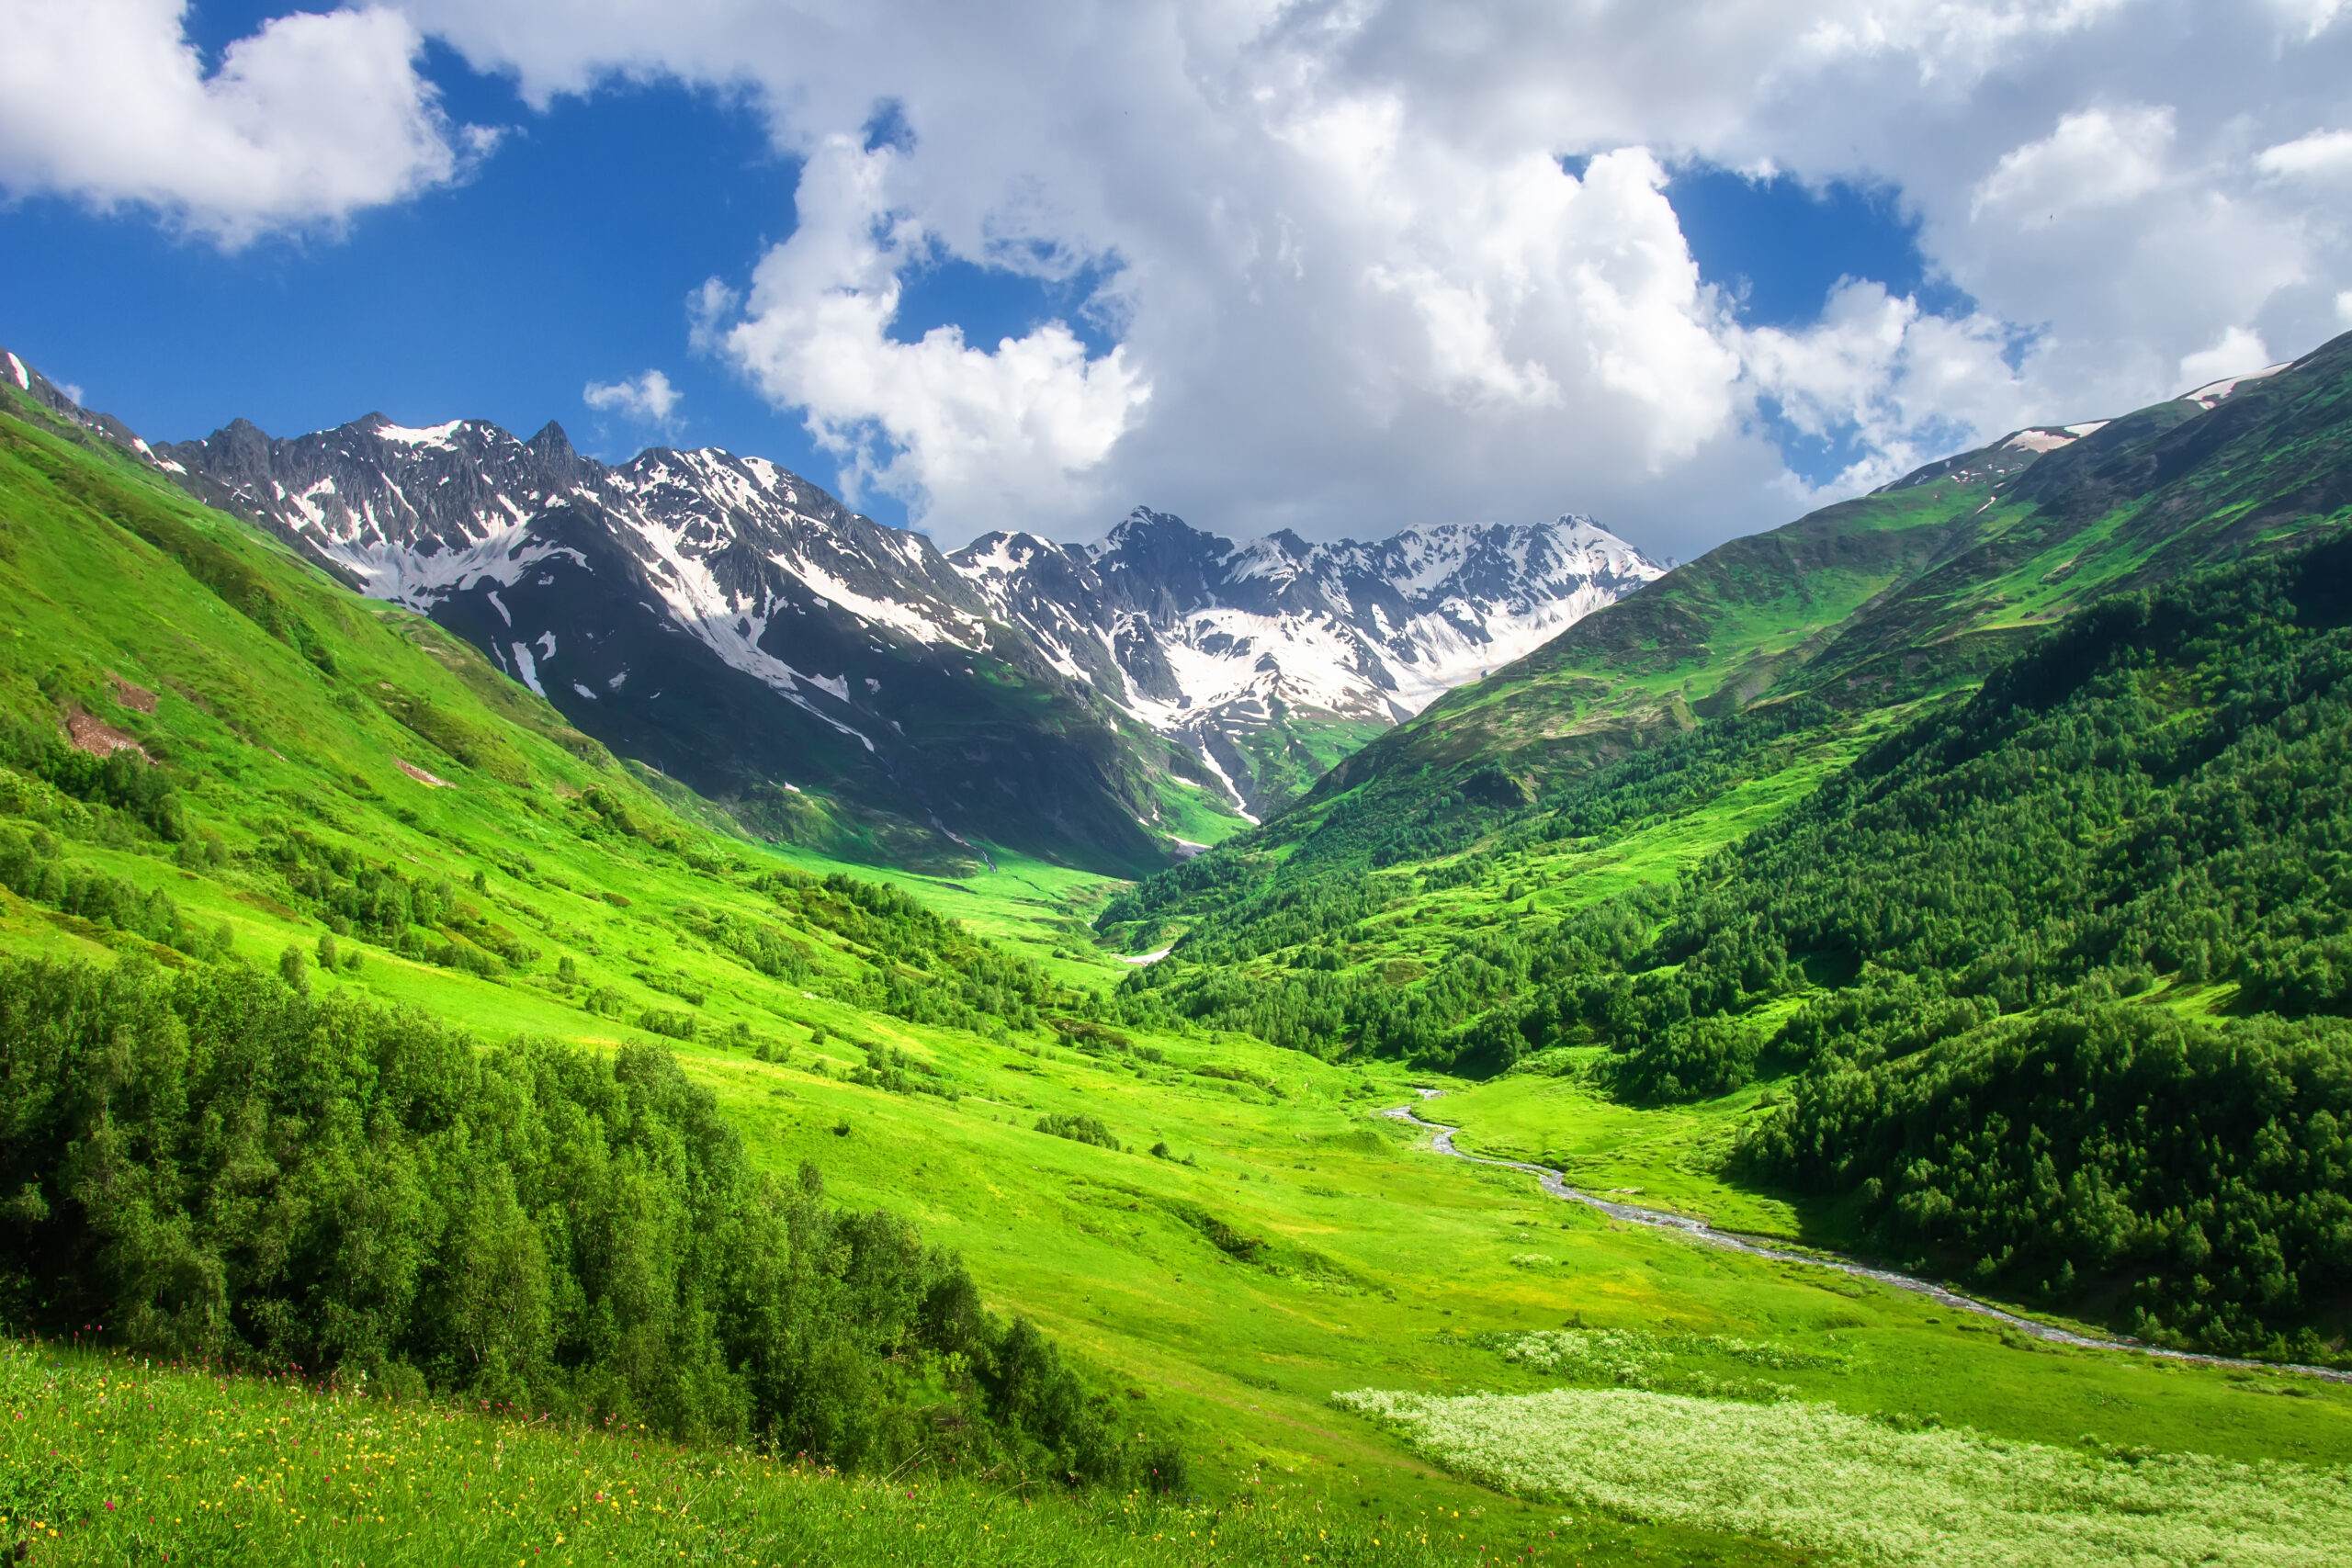 Mountains. Beautiful landscape of mountain valley. Scenic mountains. Amazing green mountain valley. Svaneti, Georgia